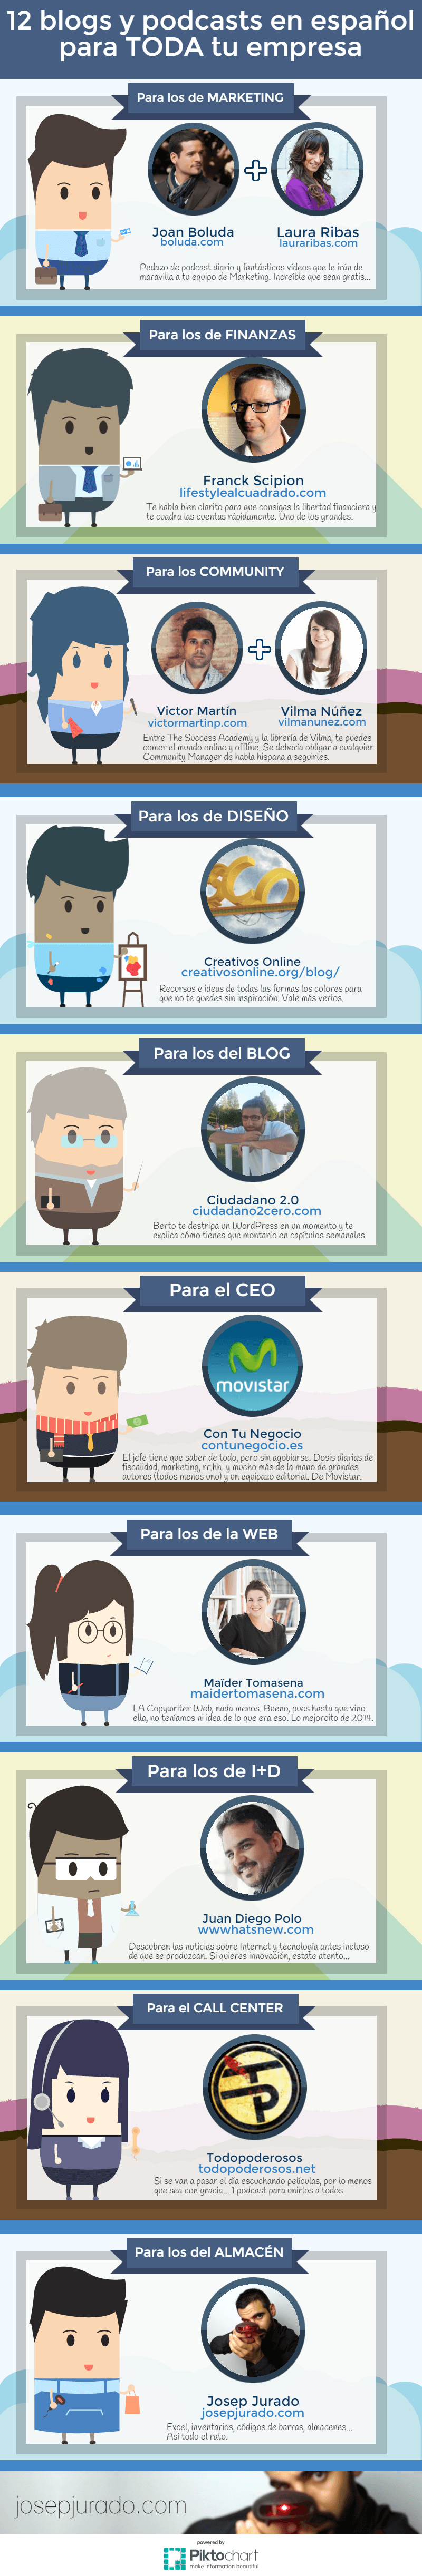 12 blogs en español para tu empresa